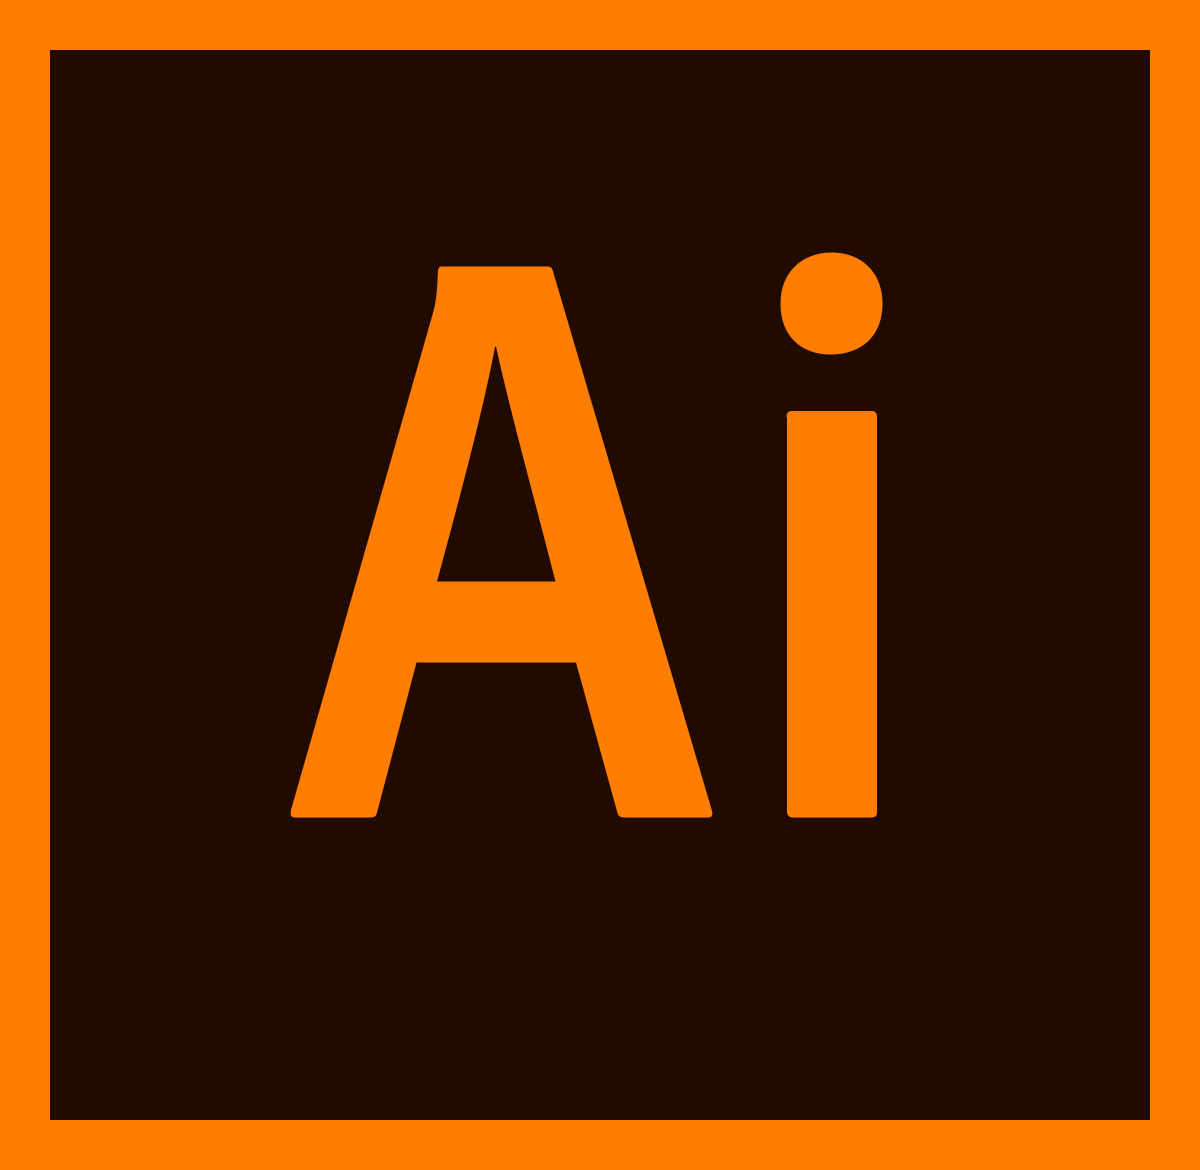 Adobe Illustrator Cc Crack Amp License Key Full Free